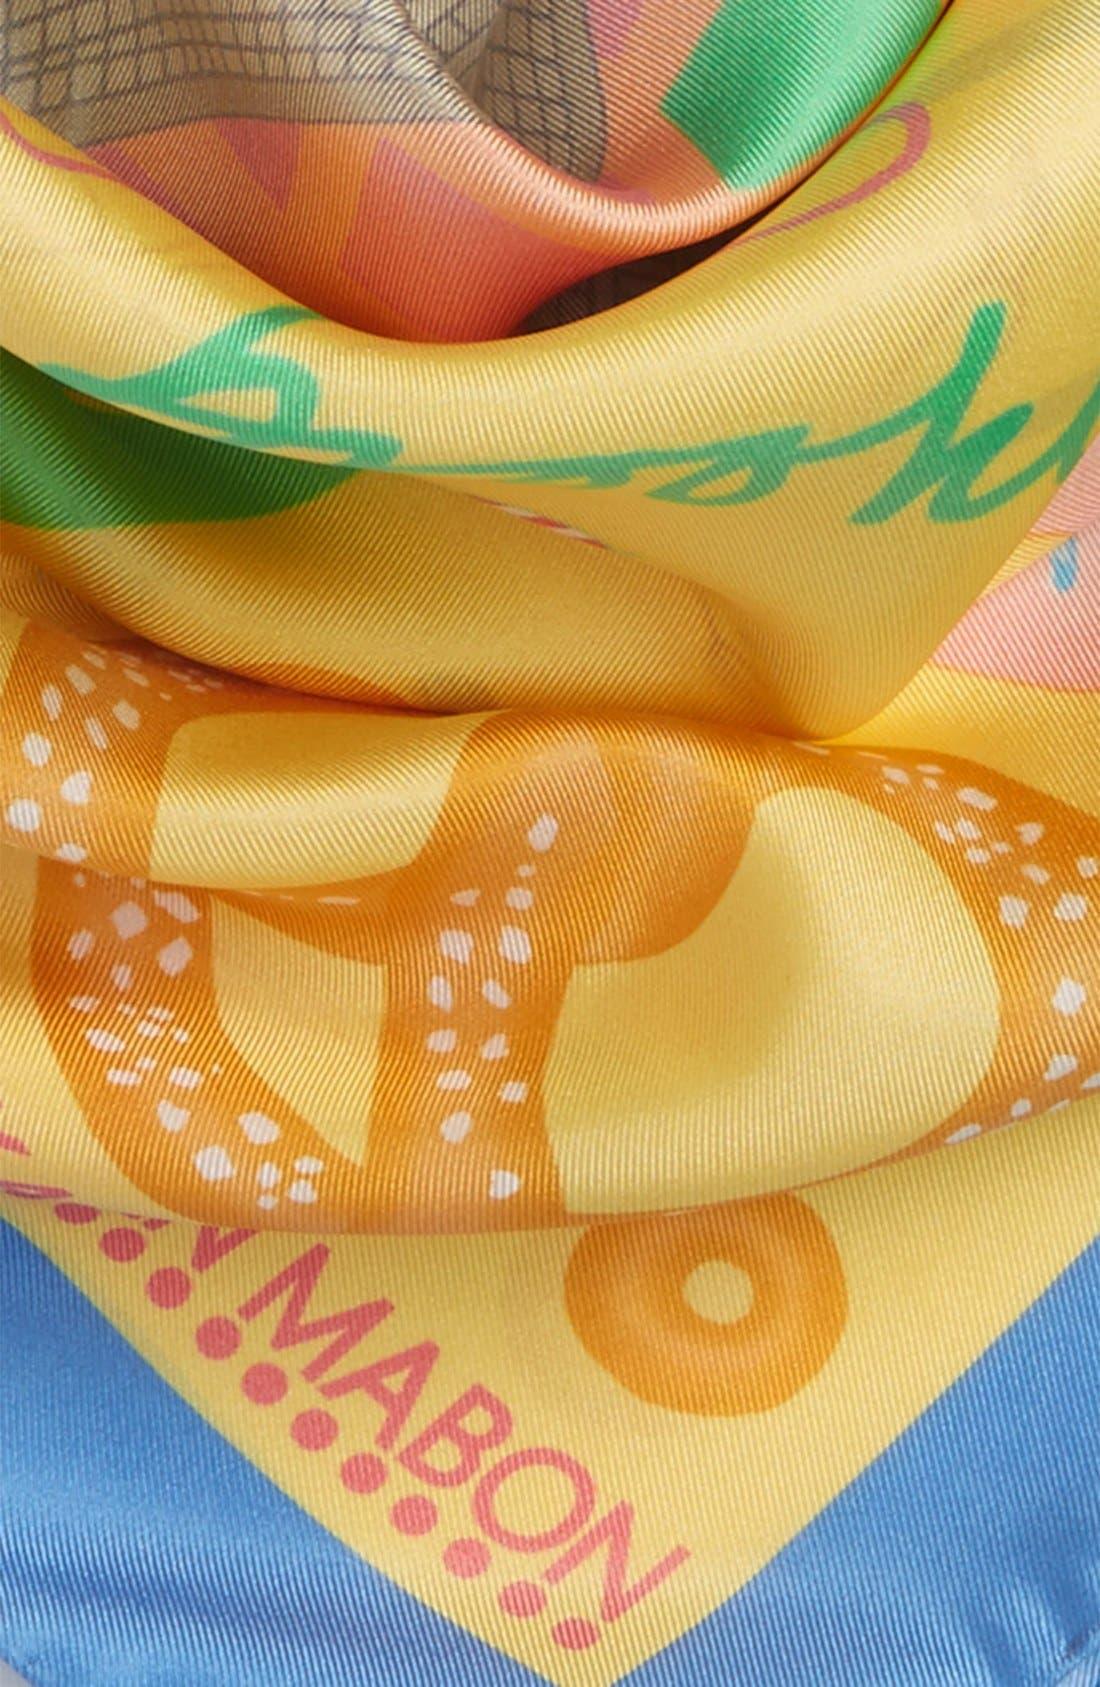 'New York, New York' Silk Square Scarf,                             Alternate thumbnail 3, color,                             Yellow